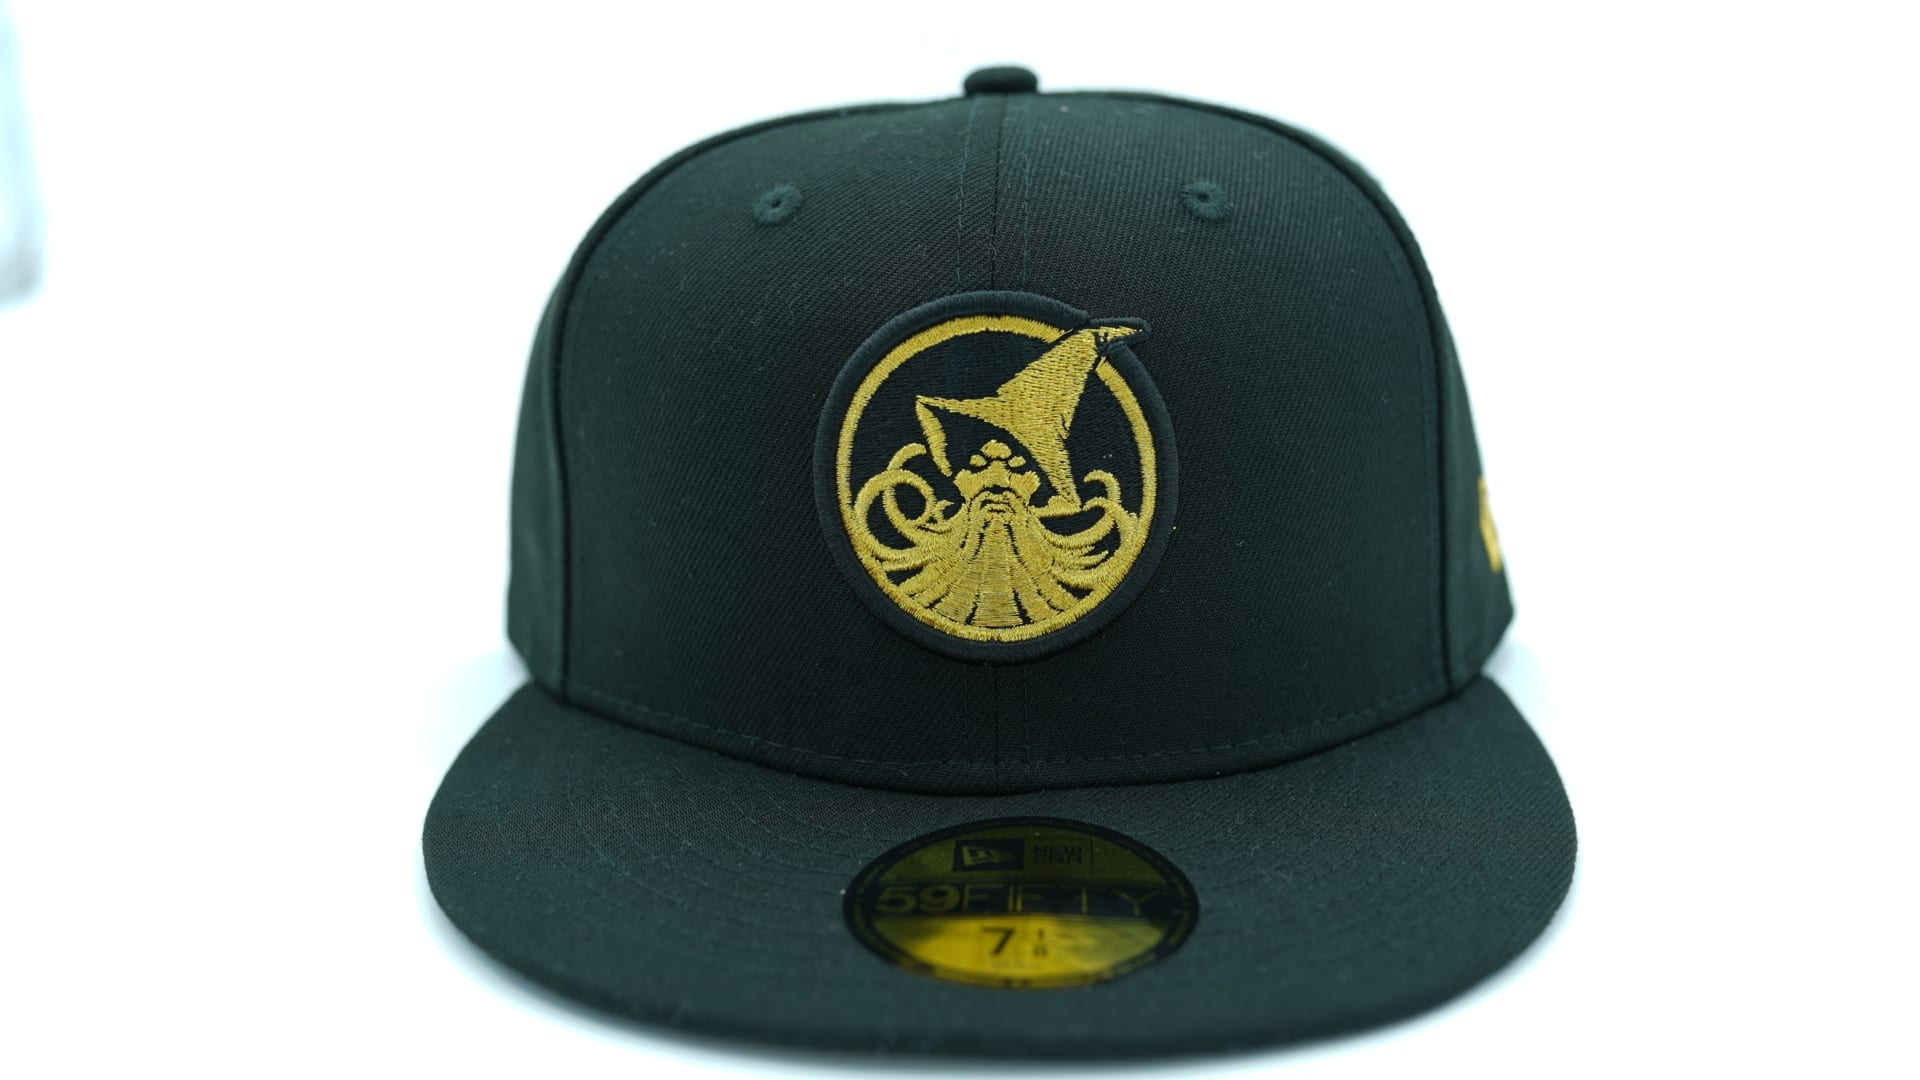 38bb15130c4a63 ... inexpensive dallas cowboys legacy vapor swoosh flex hat by nike x nfl  dfa3a 945e5